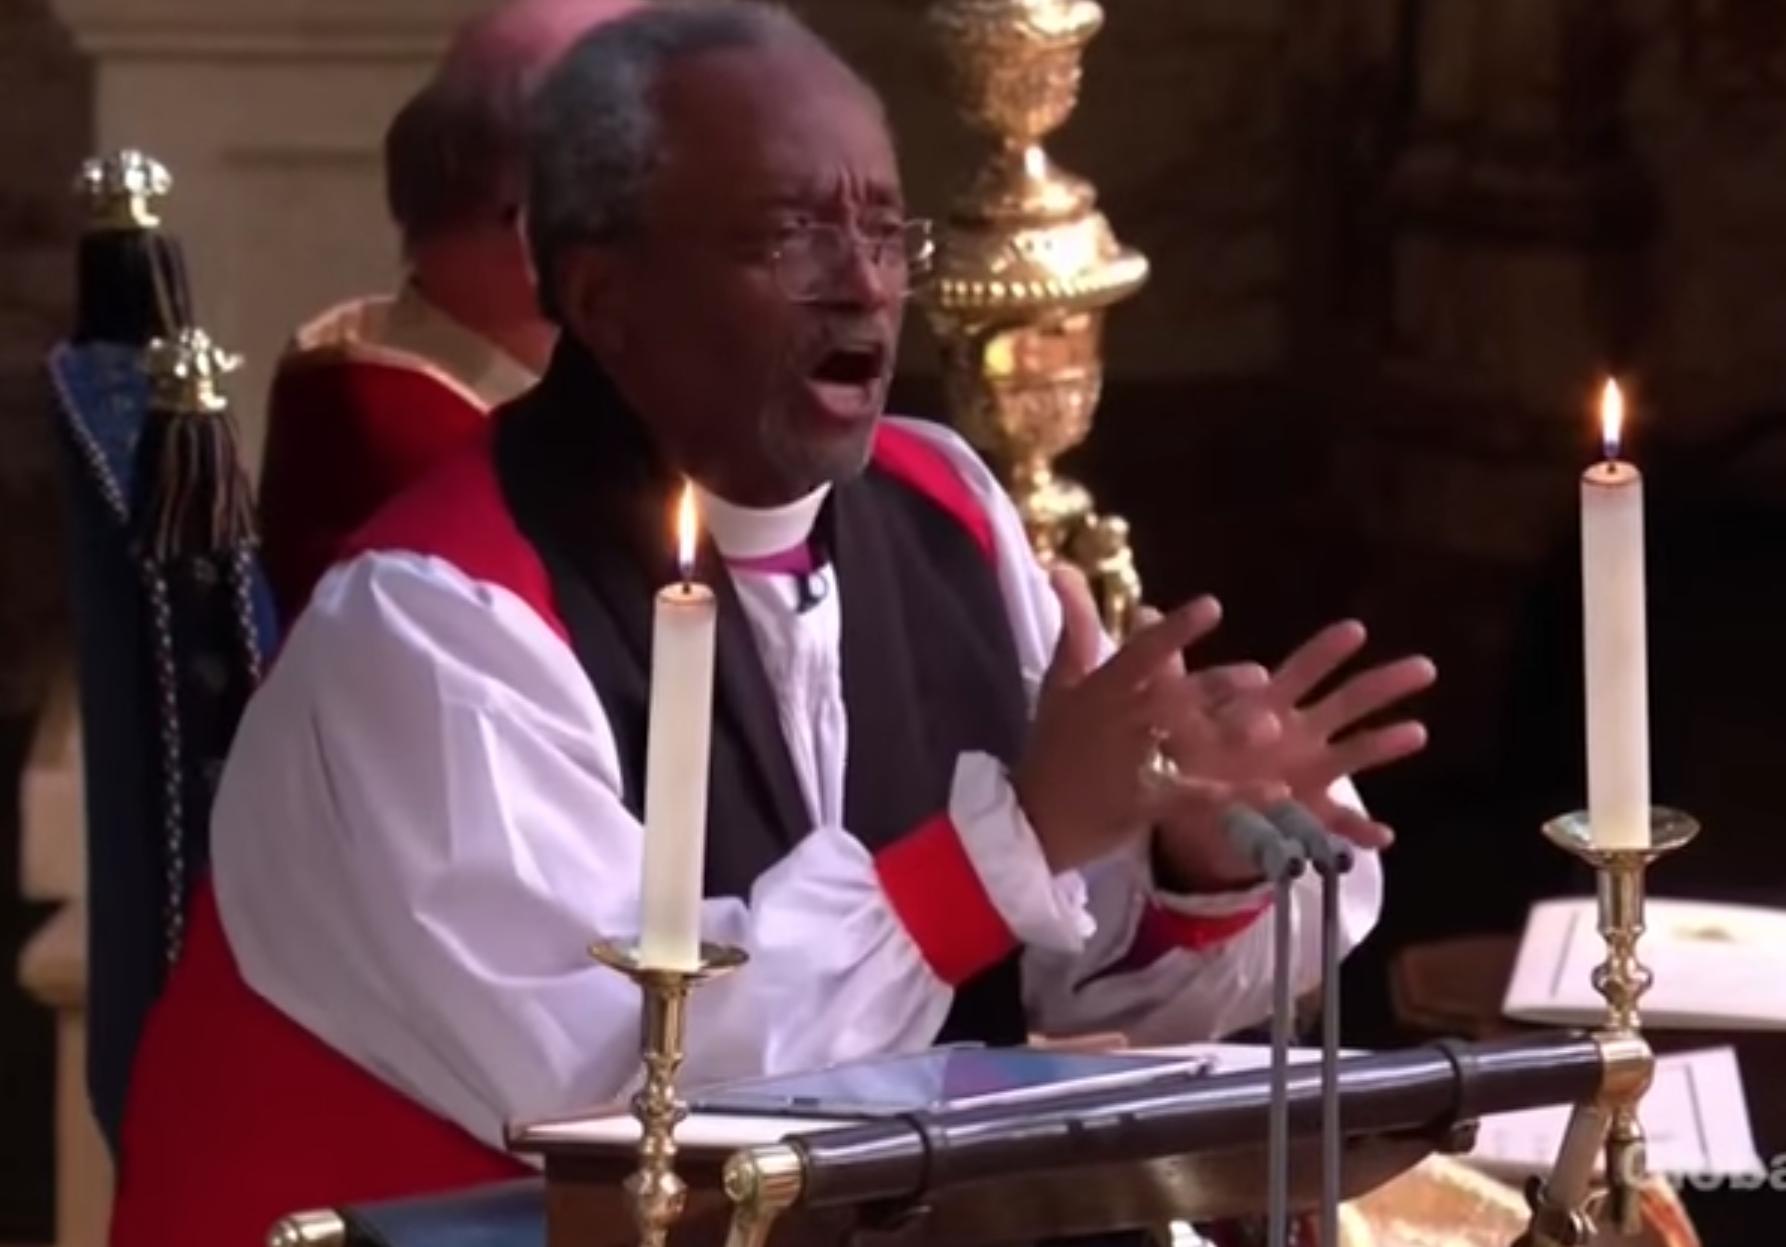 Royal Wedding Preacher Presiding Bishop Michael Curry Shares His